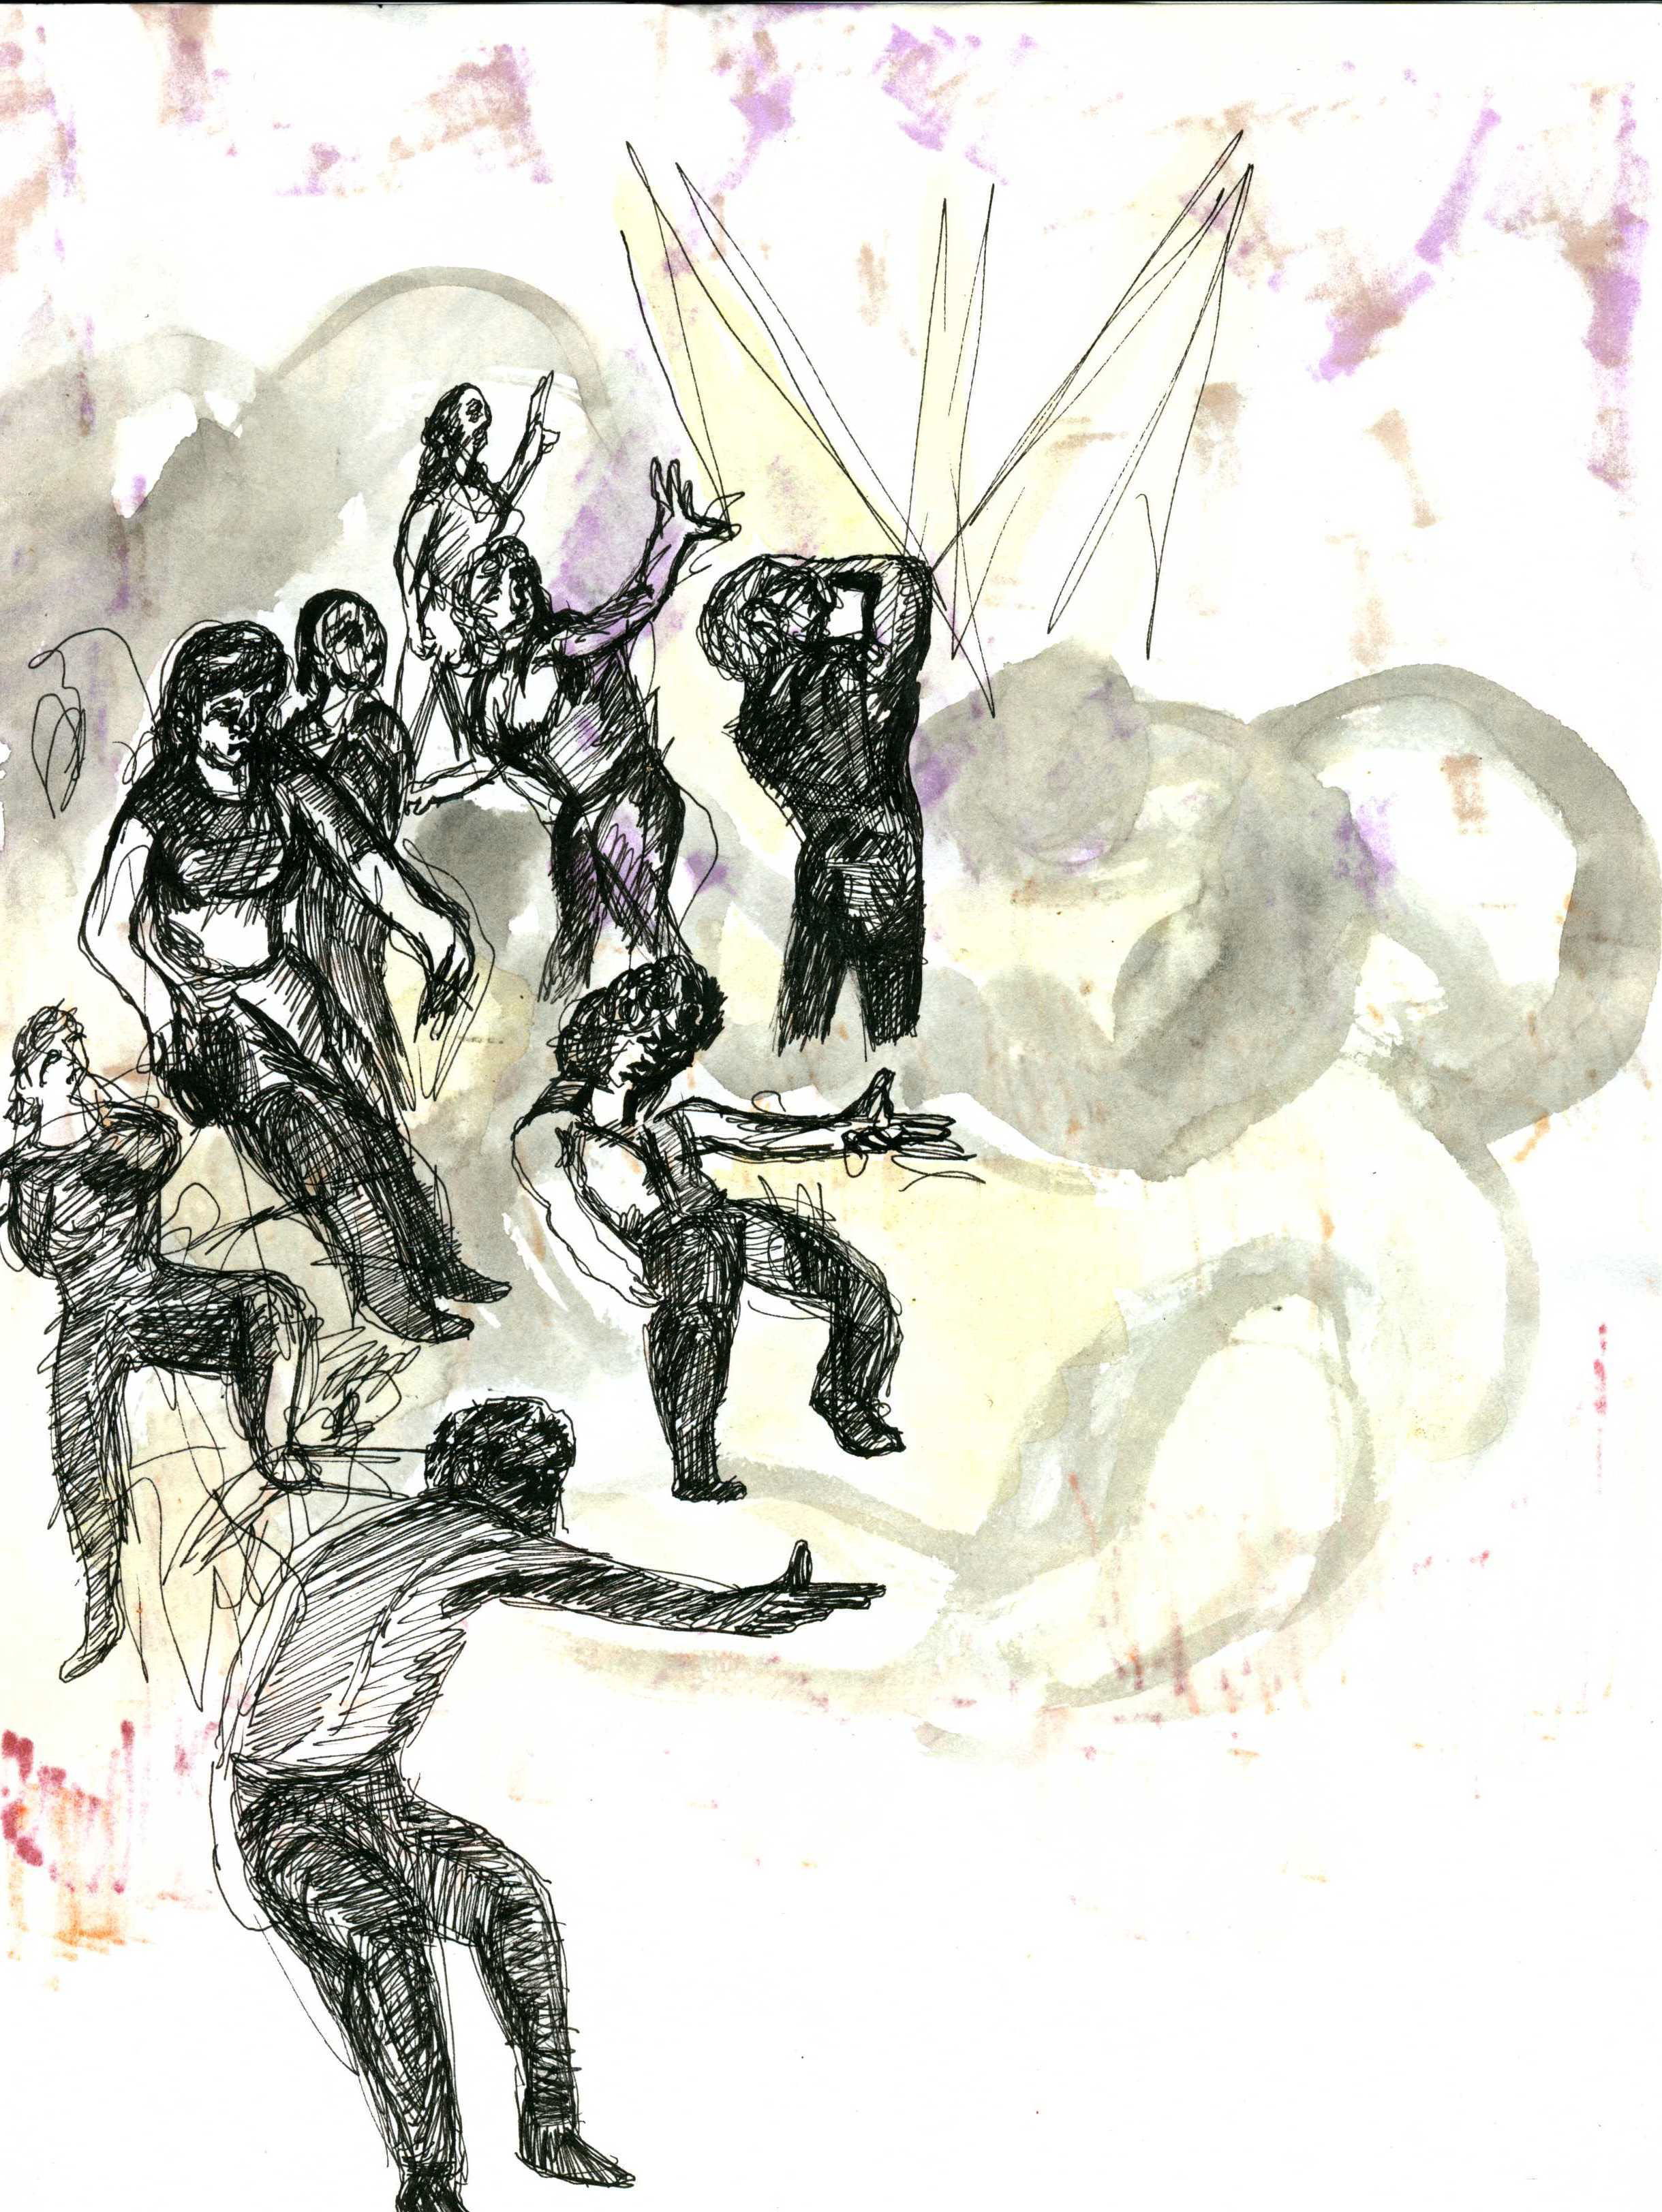 Artist: Chuck Schultz